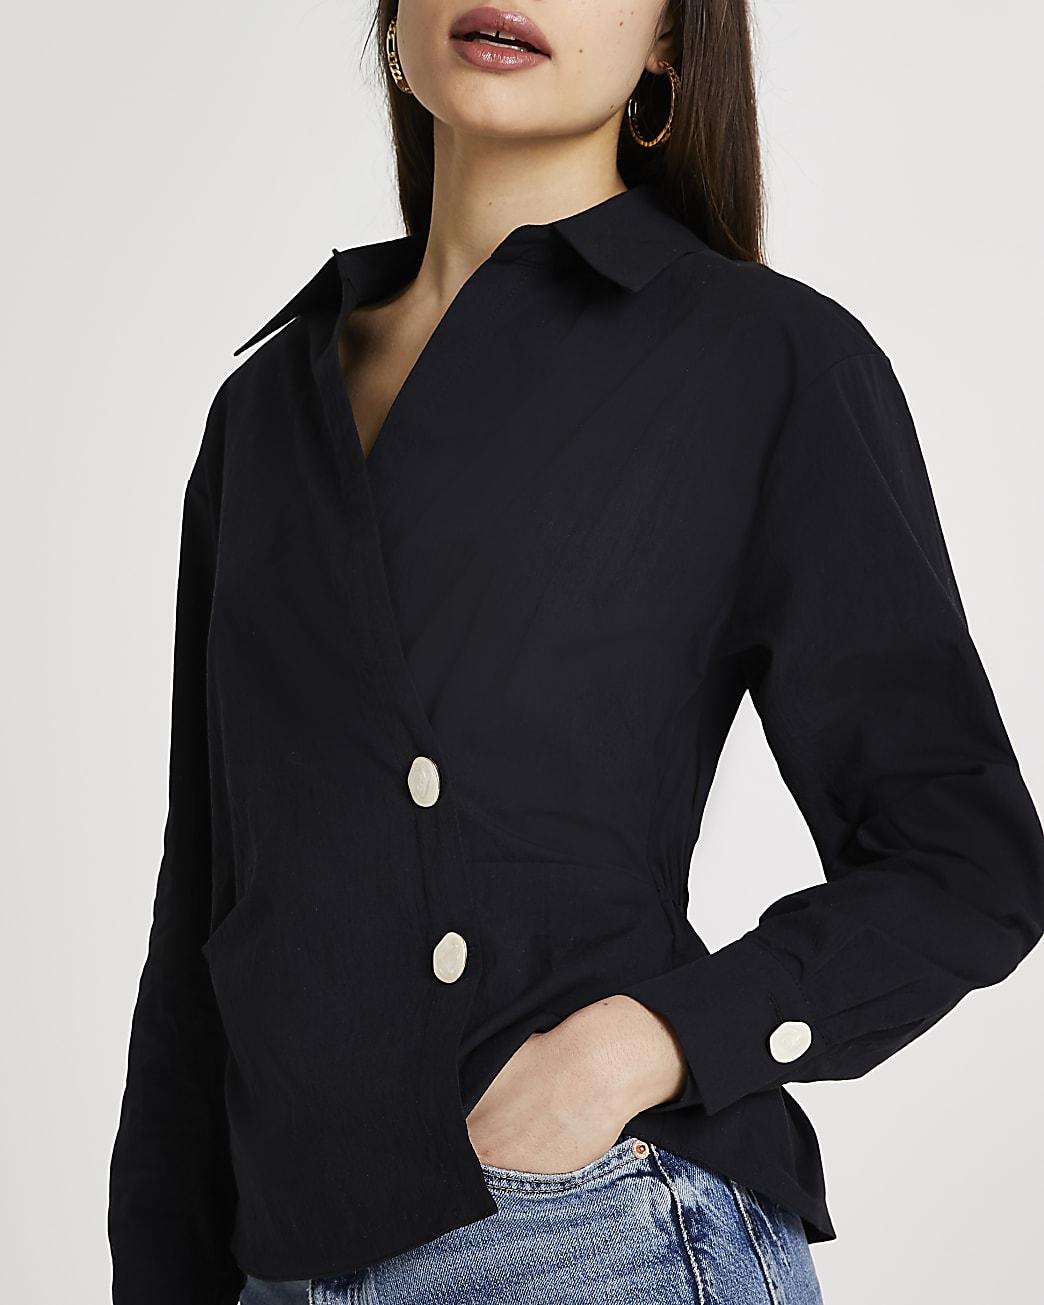 Black side tuck long sleeve shirt